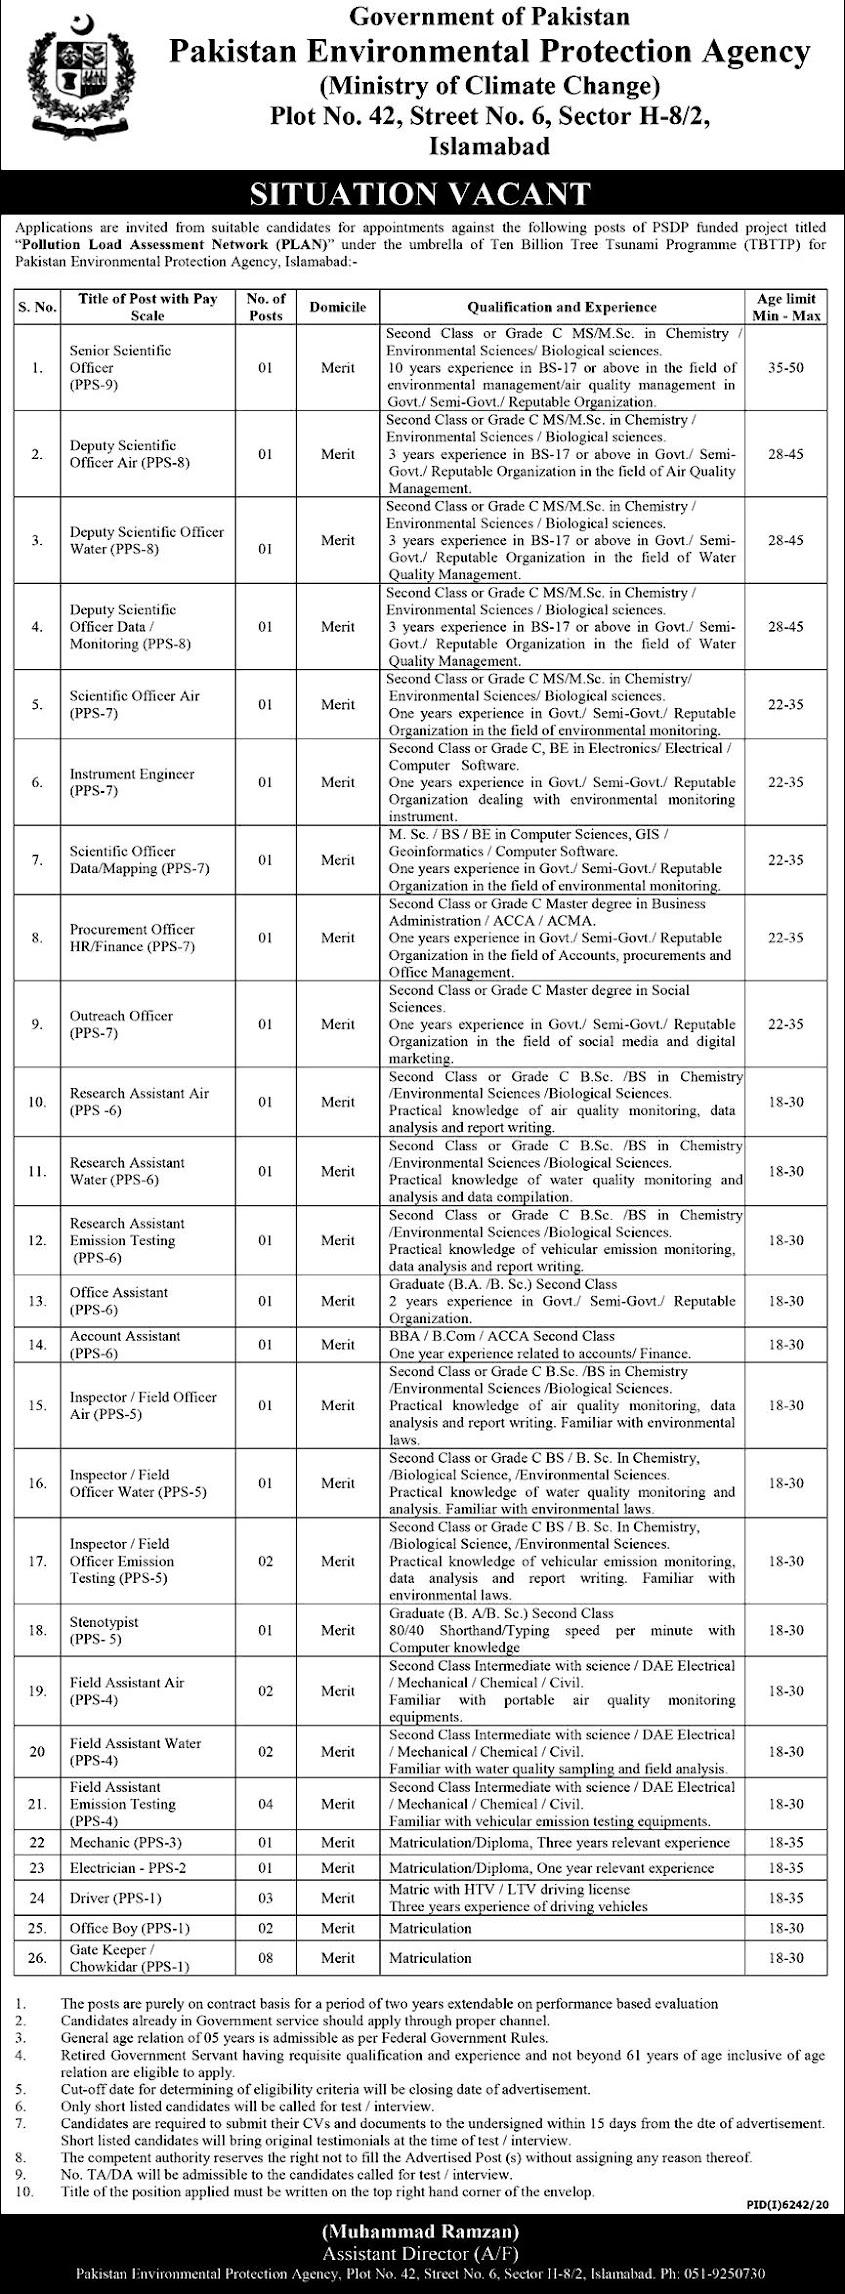 Latest Jobs in Pakistan Environmental Protection Agency PEPA 2021